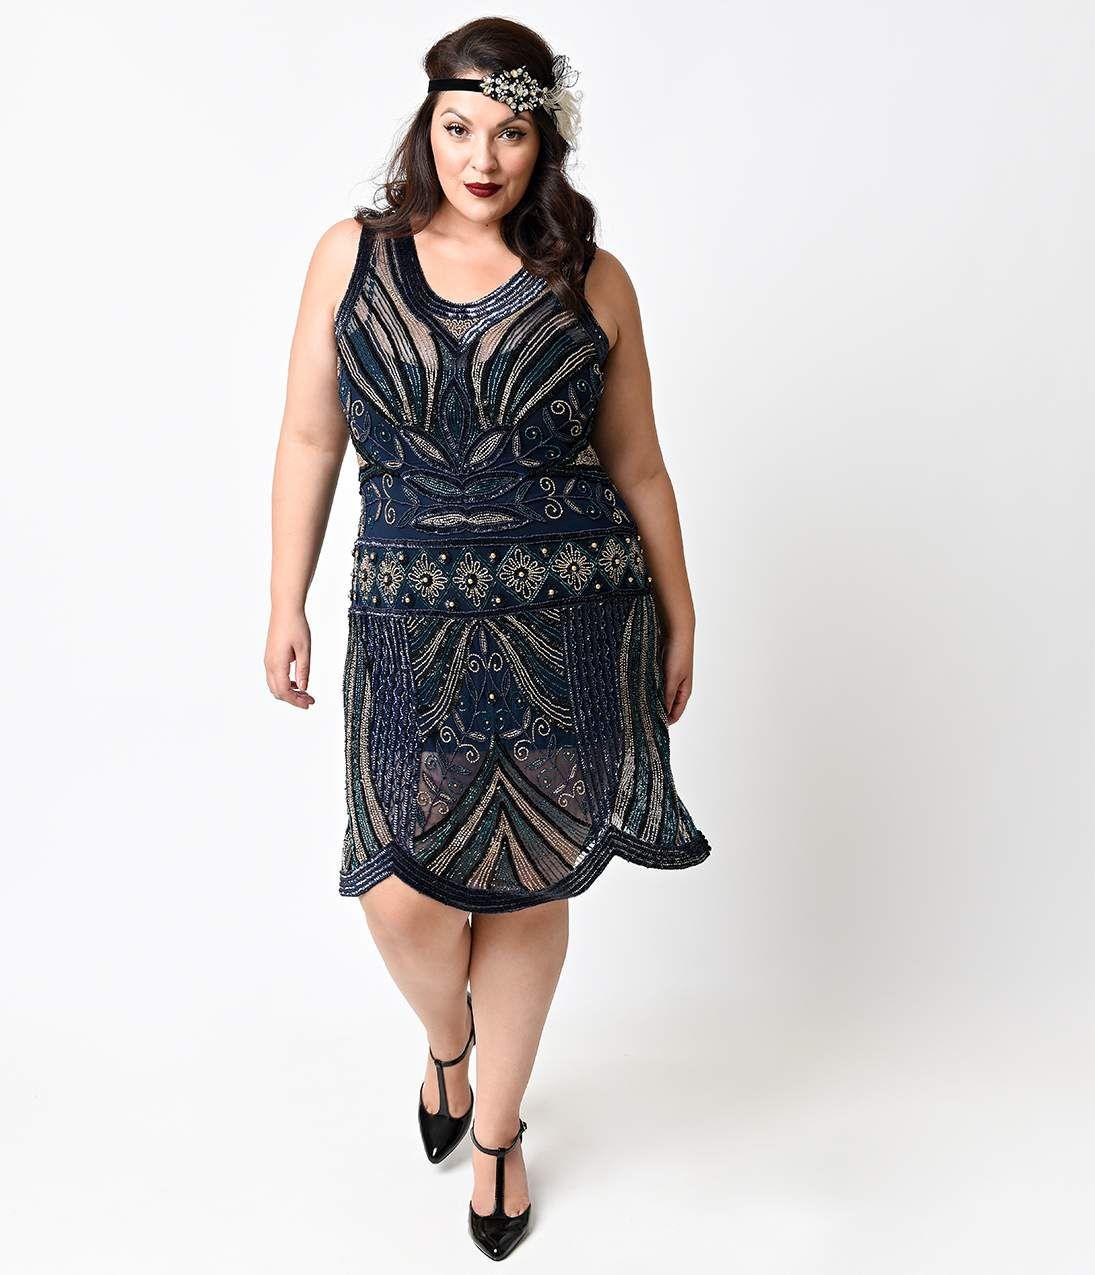 plus size 1920s dress attire | Robes garçonnes, Robe grande